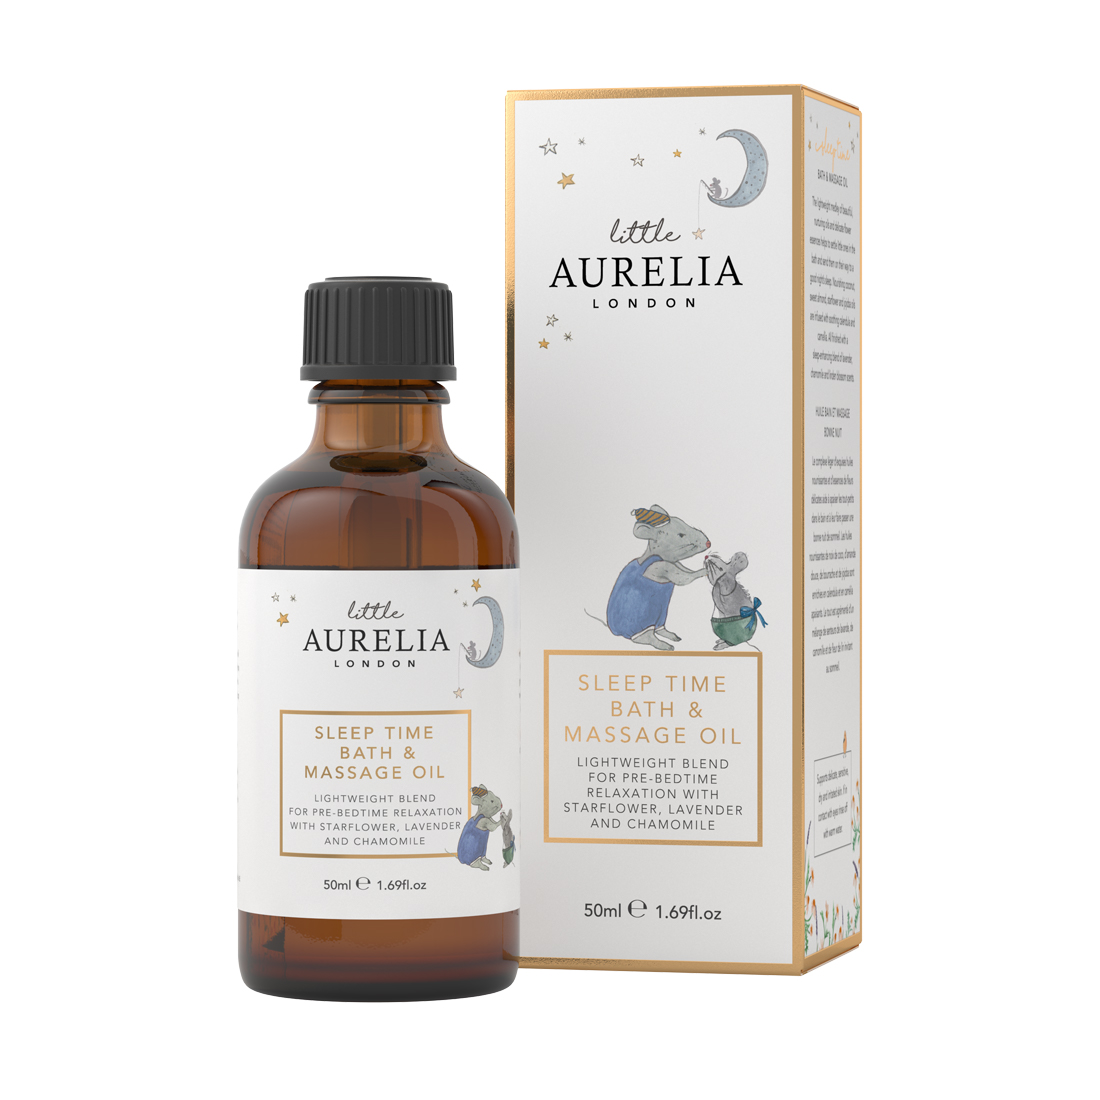 An image of Sleep Time Bath & Massage Oil for Babies 50ml Little Aurelia